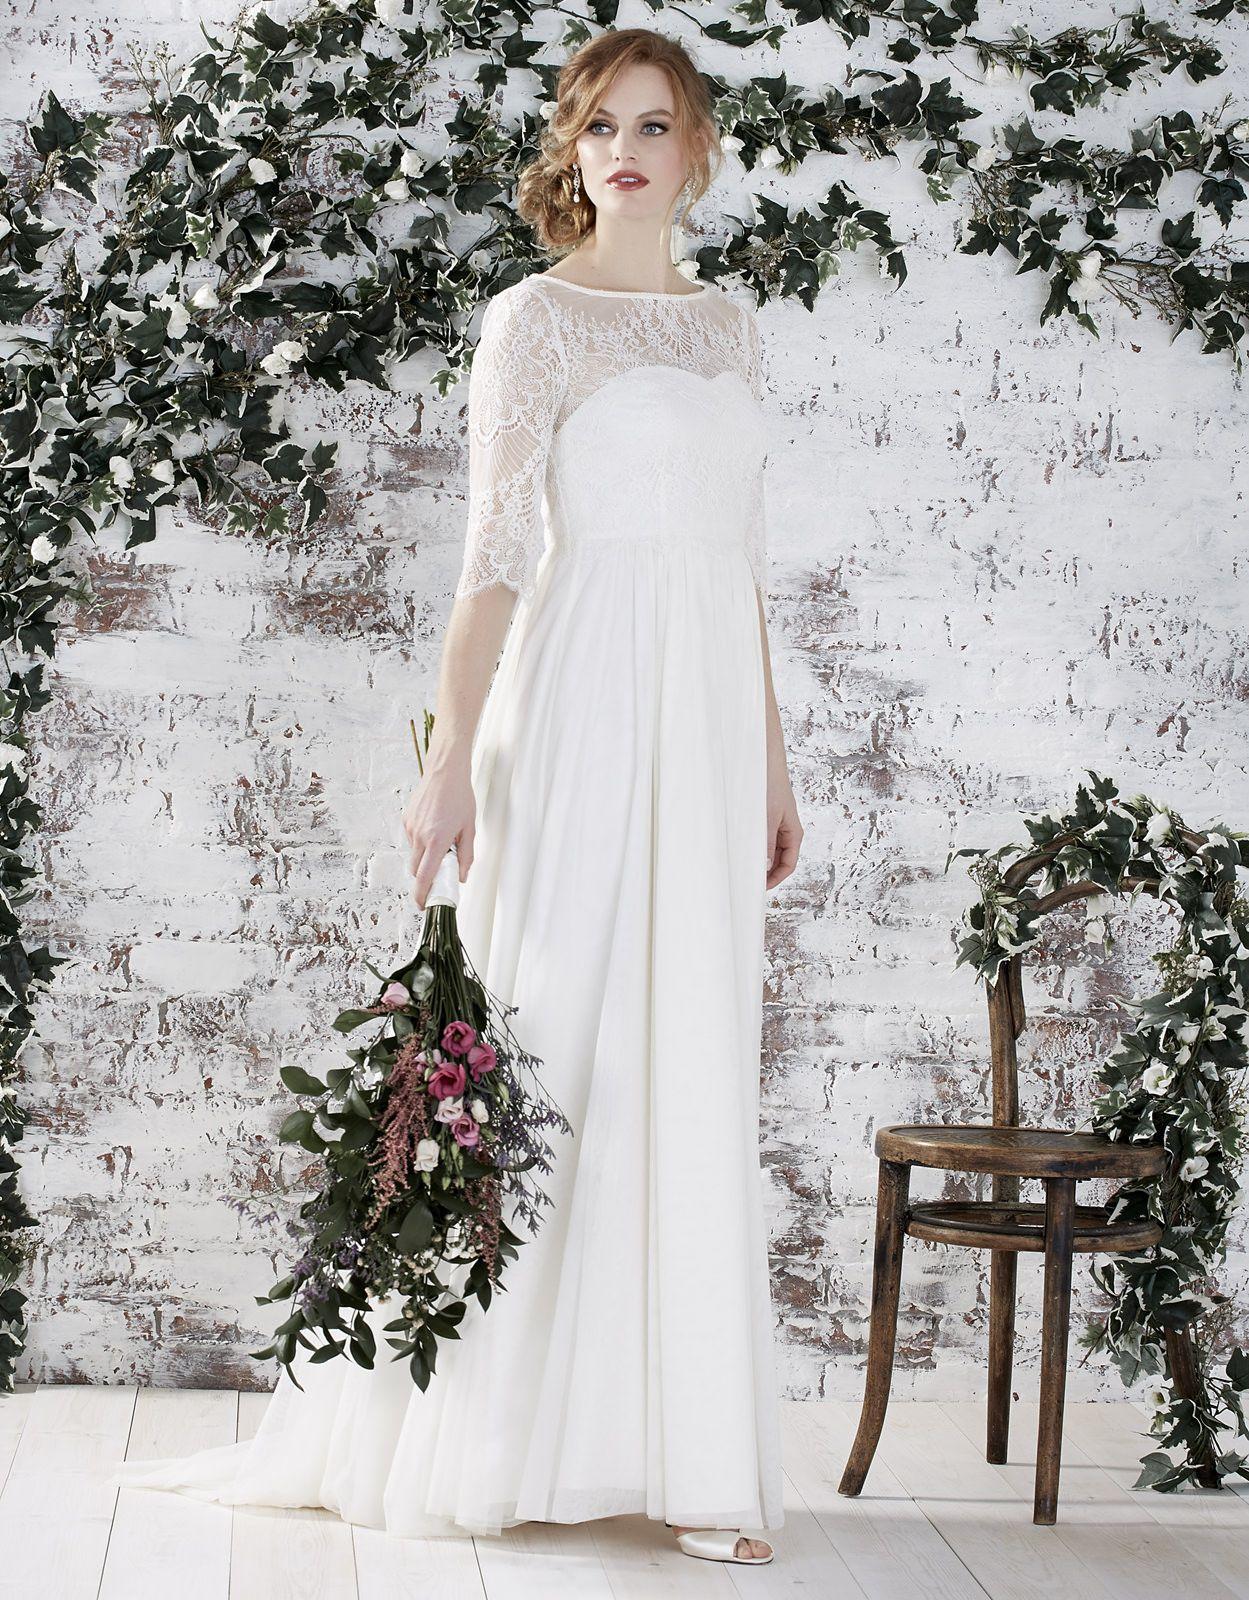 Monsoon Bridal SS16 | Monsoon, High street wedding dresses and ...